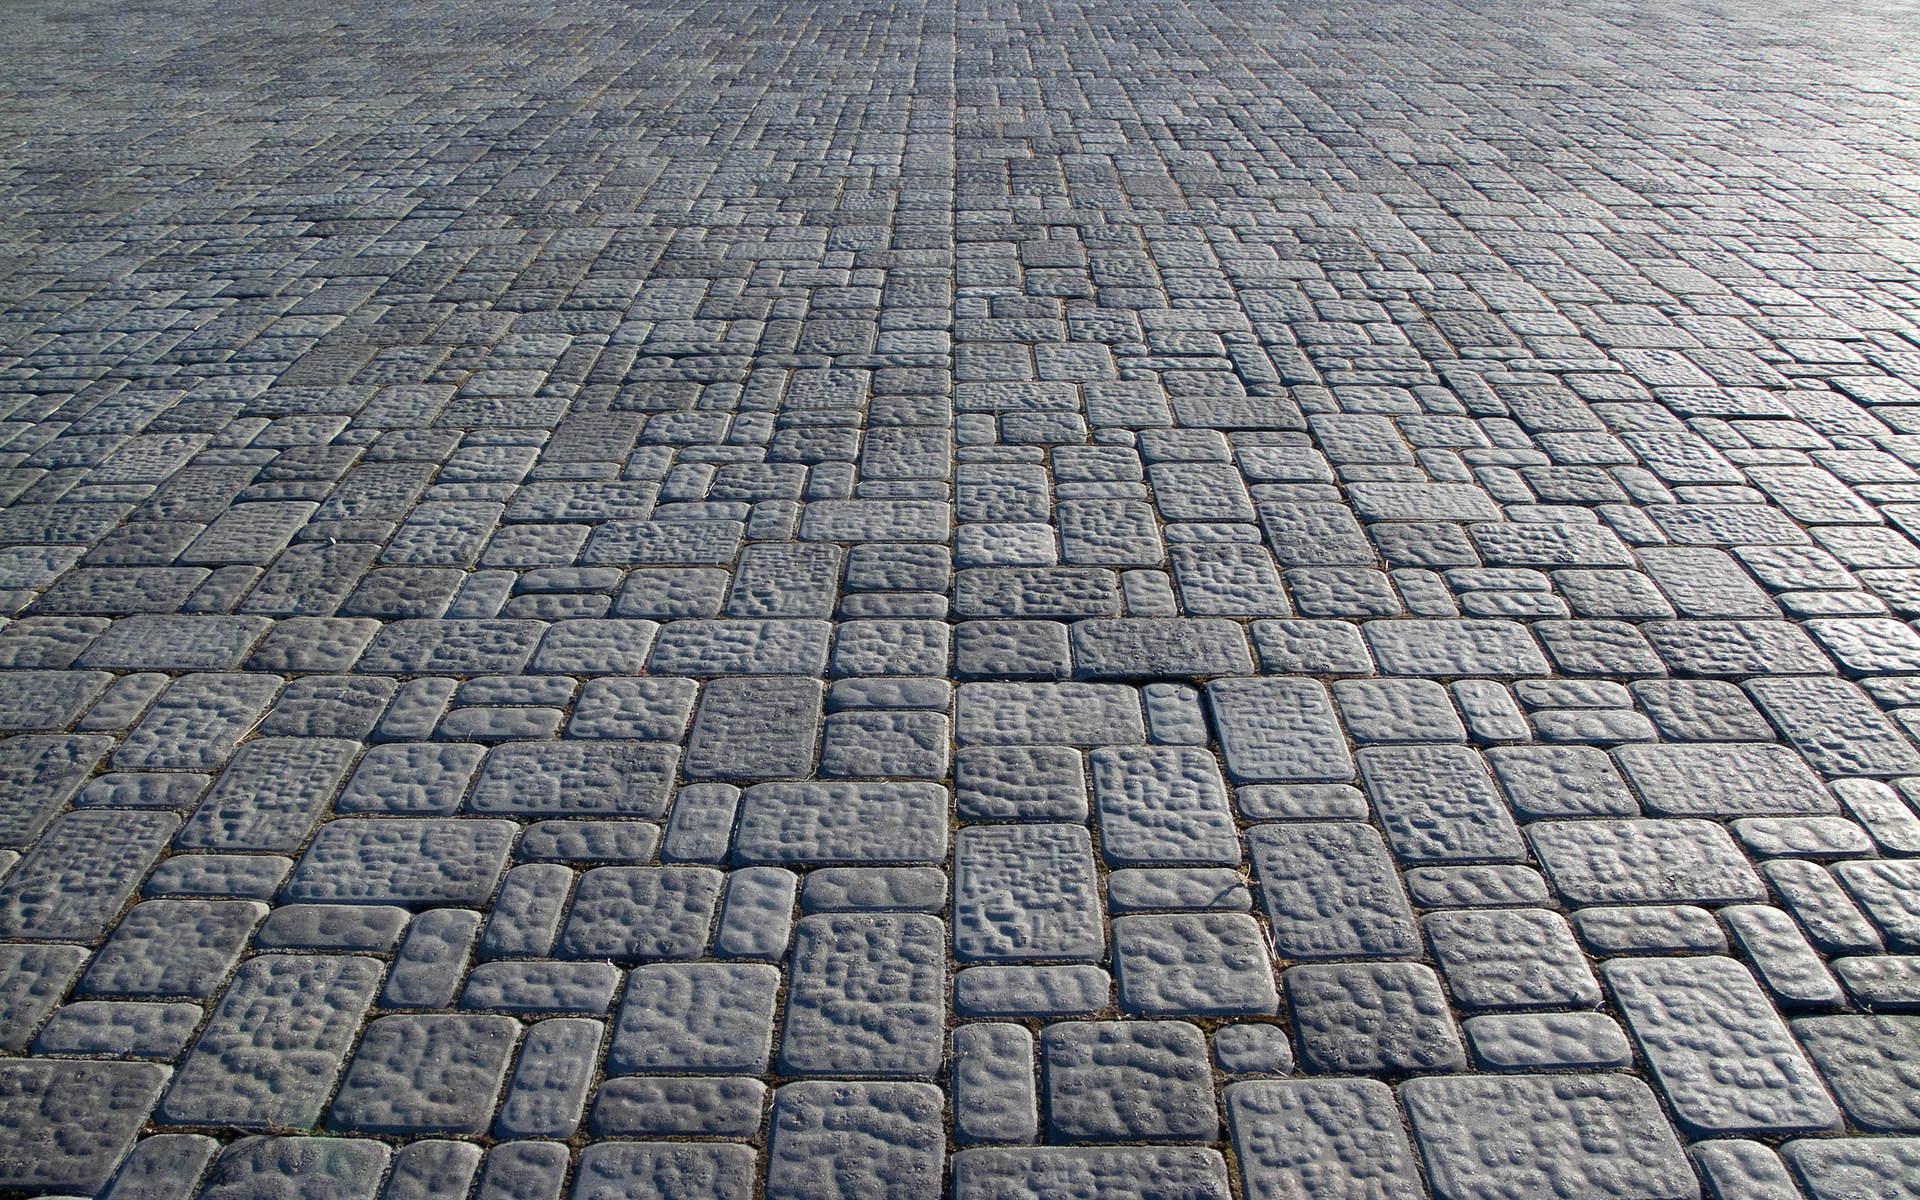 плитка, пол, земля